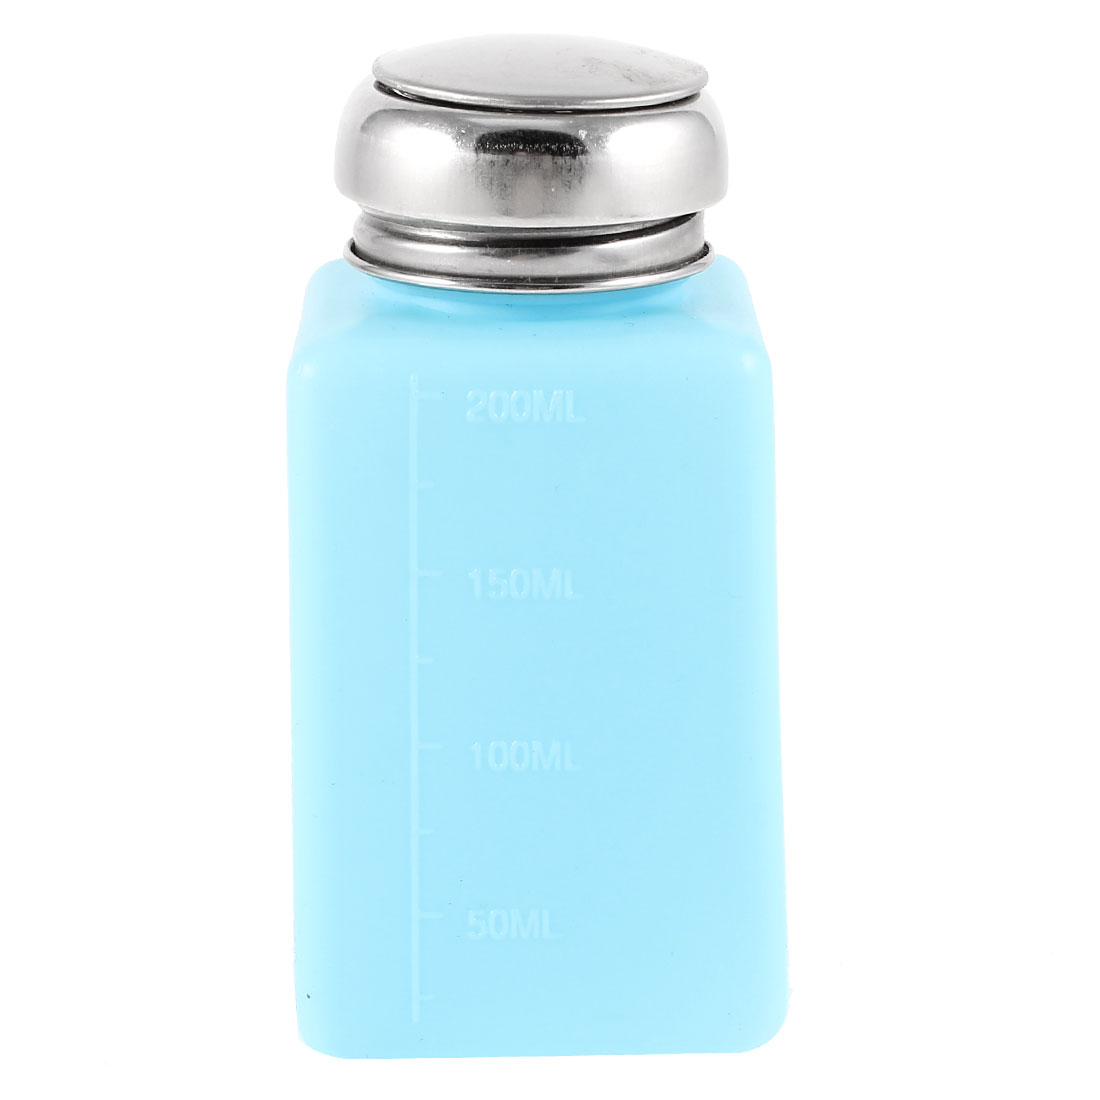 Silver Tone Metal Cover 200ml Plastic Liquid Storage Alcohol Bottle Cyan